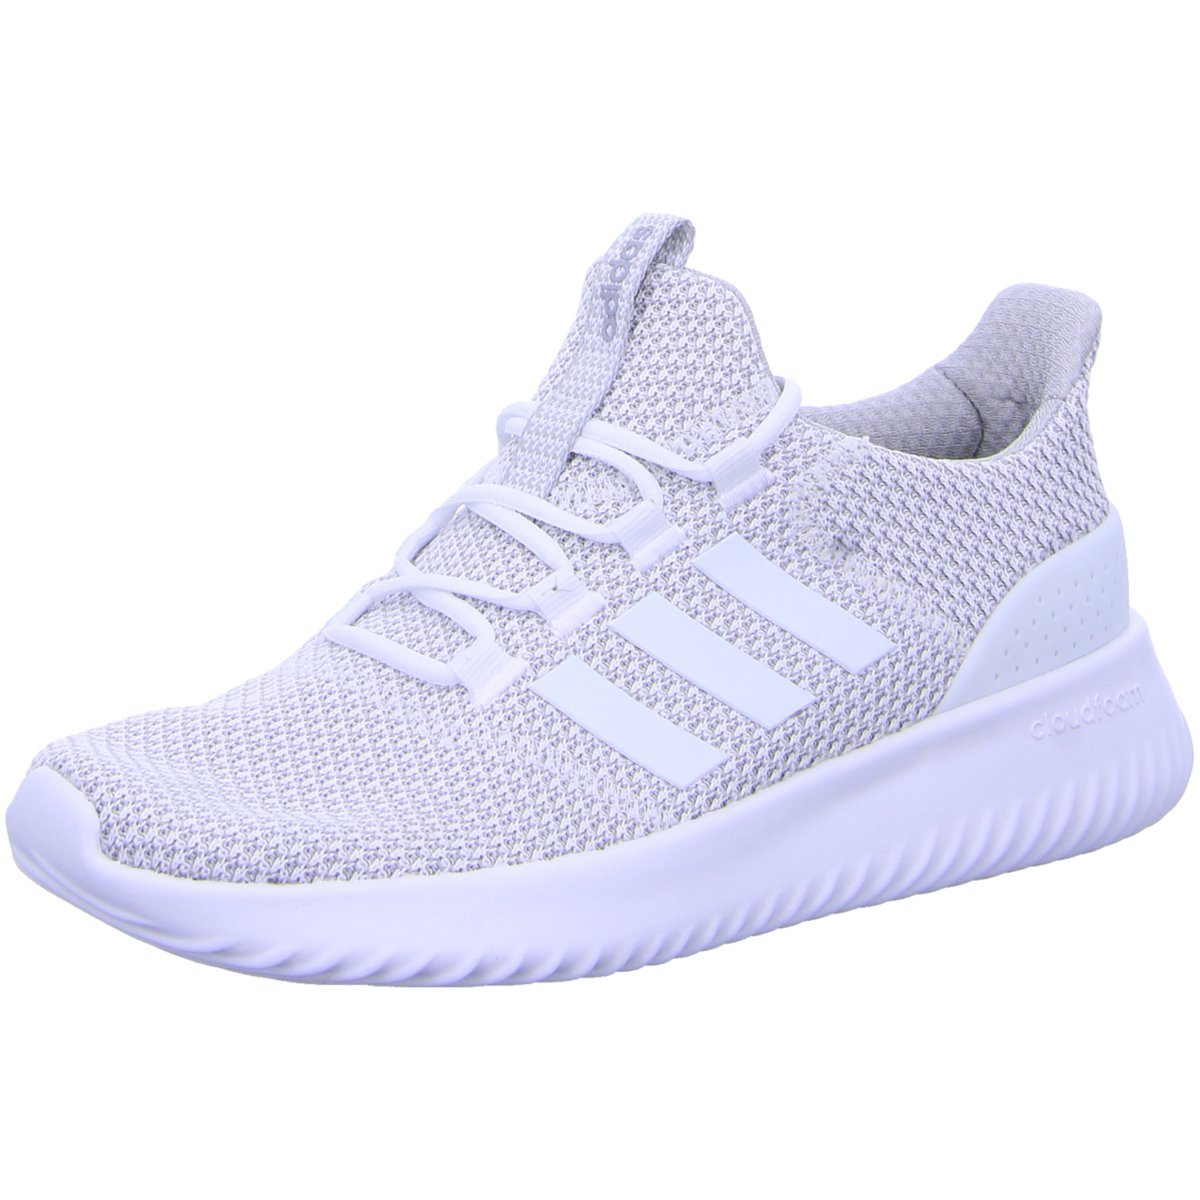 NEU adidas Herren Sneaker Cloudfoam Ultimate BC0121 weiß 334409